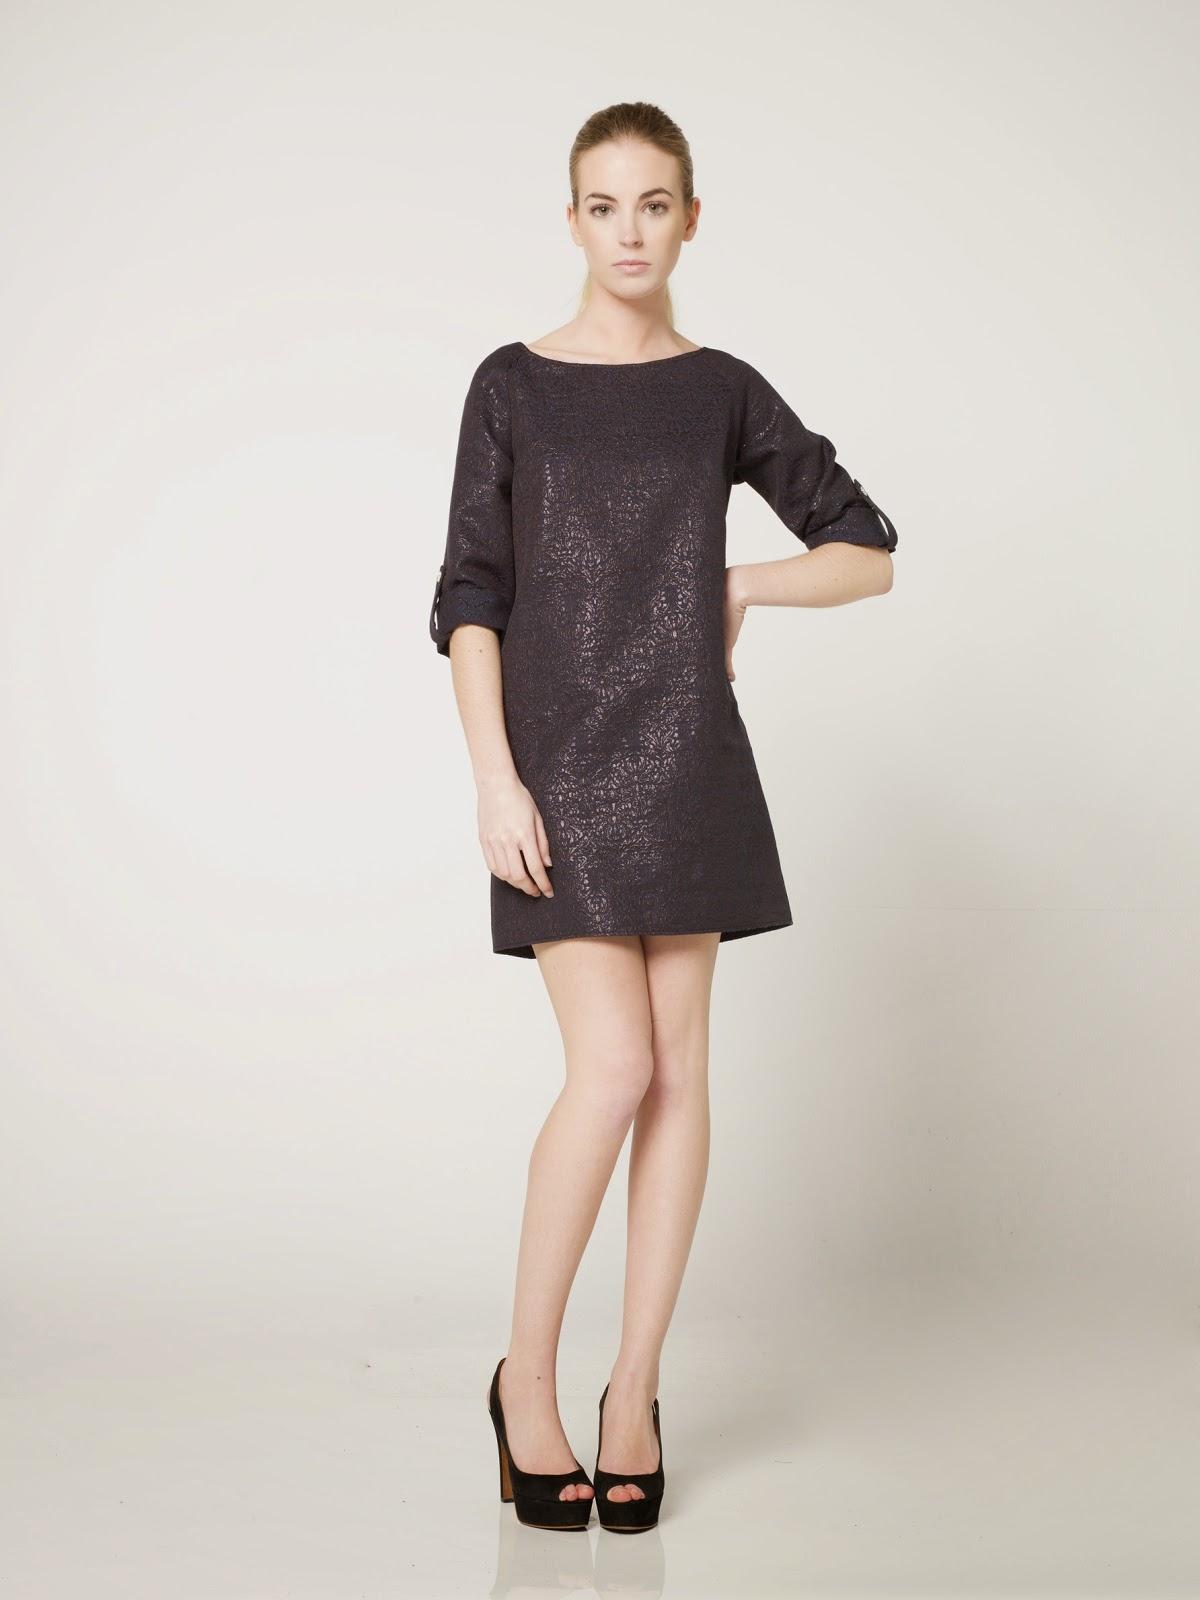 LYNBER - vestido corto